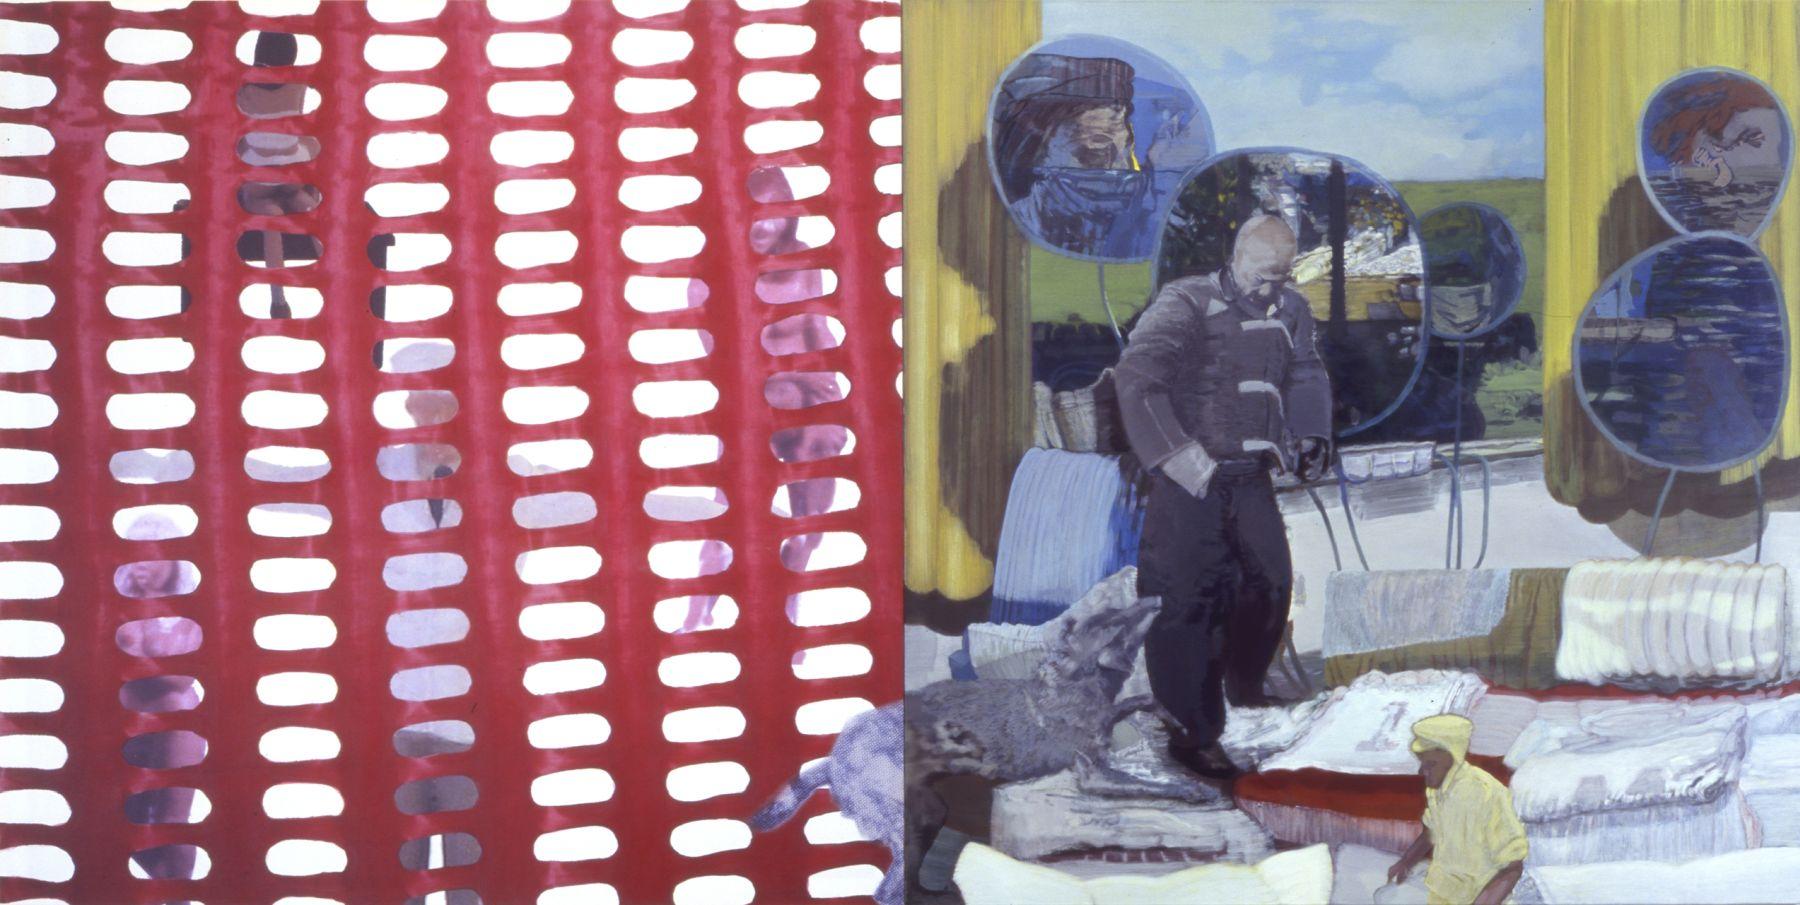 31. Research, 2006, acrylic/oil/print/canvas, 200 x 400 cm